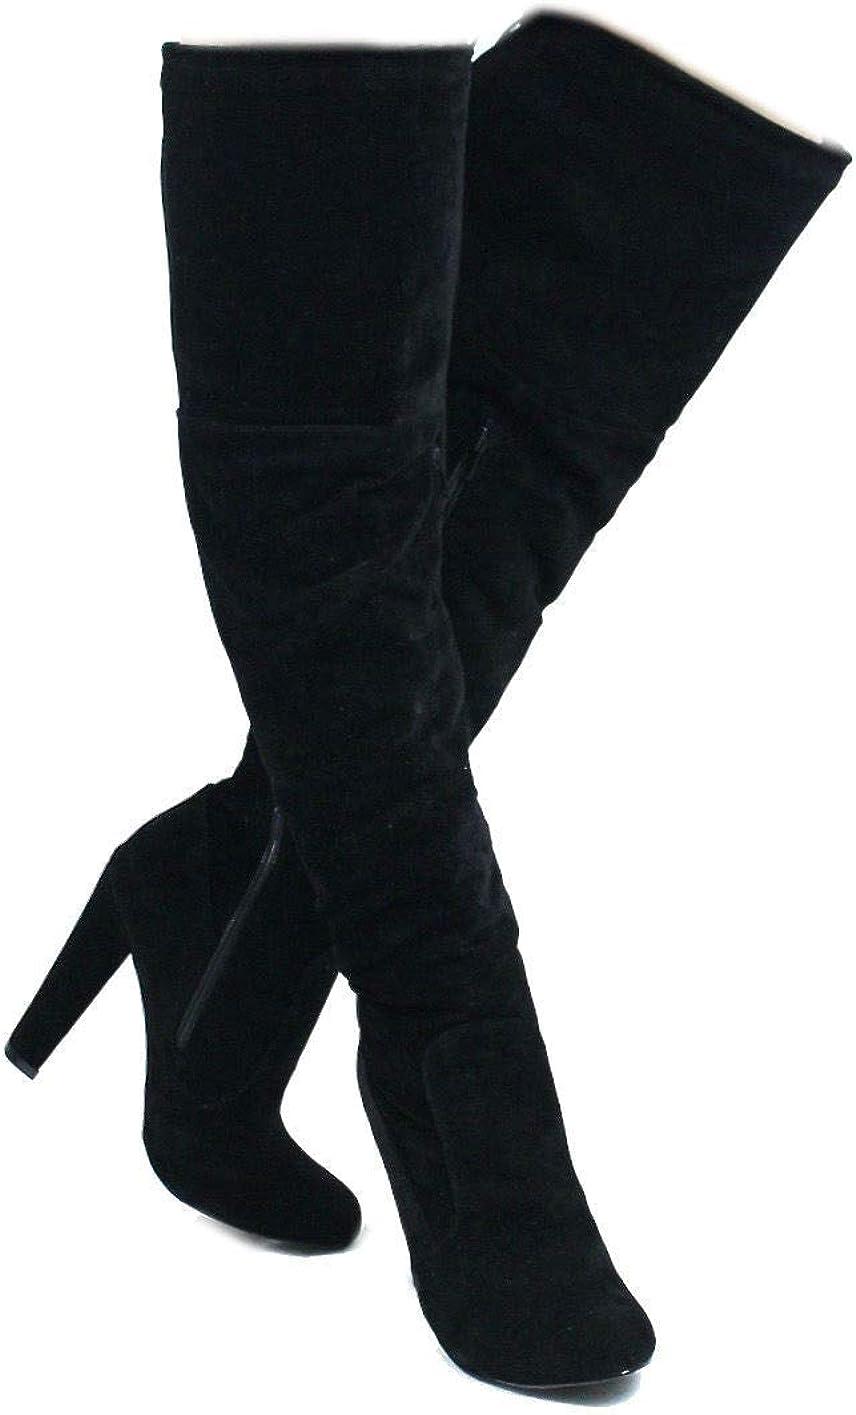 Sophie Round Superlatite Toe Over The Knee Heel High Boot Ranking TOP18 Dress Chunky Thigh